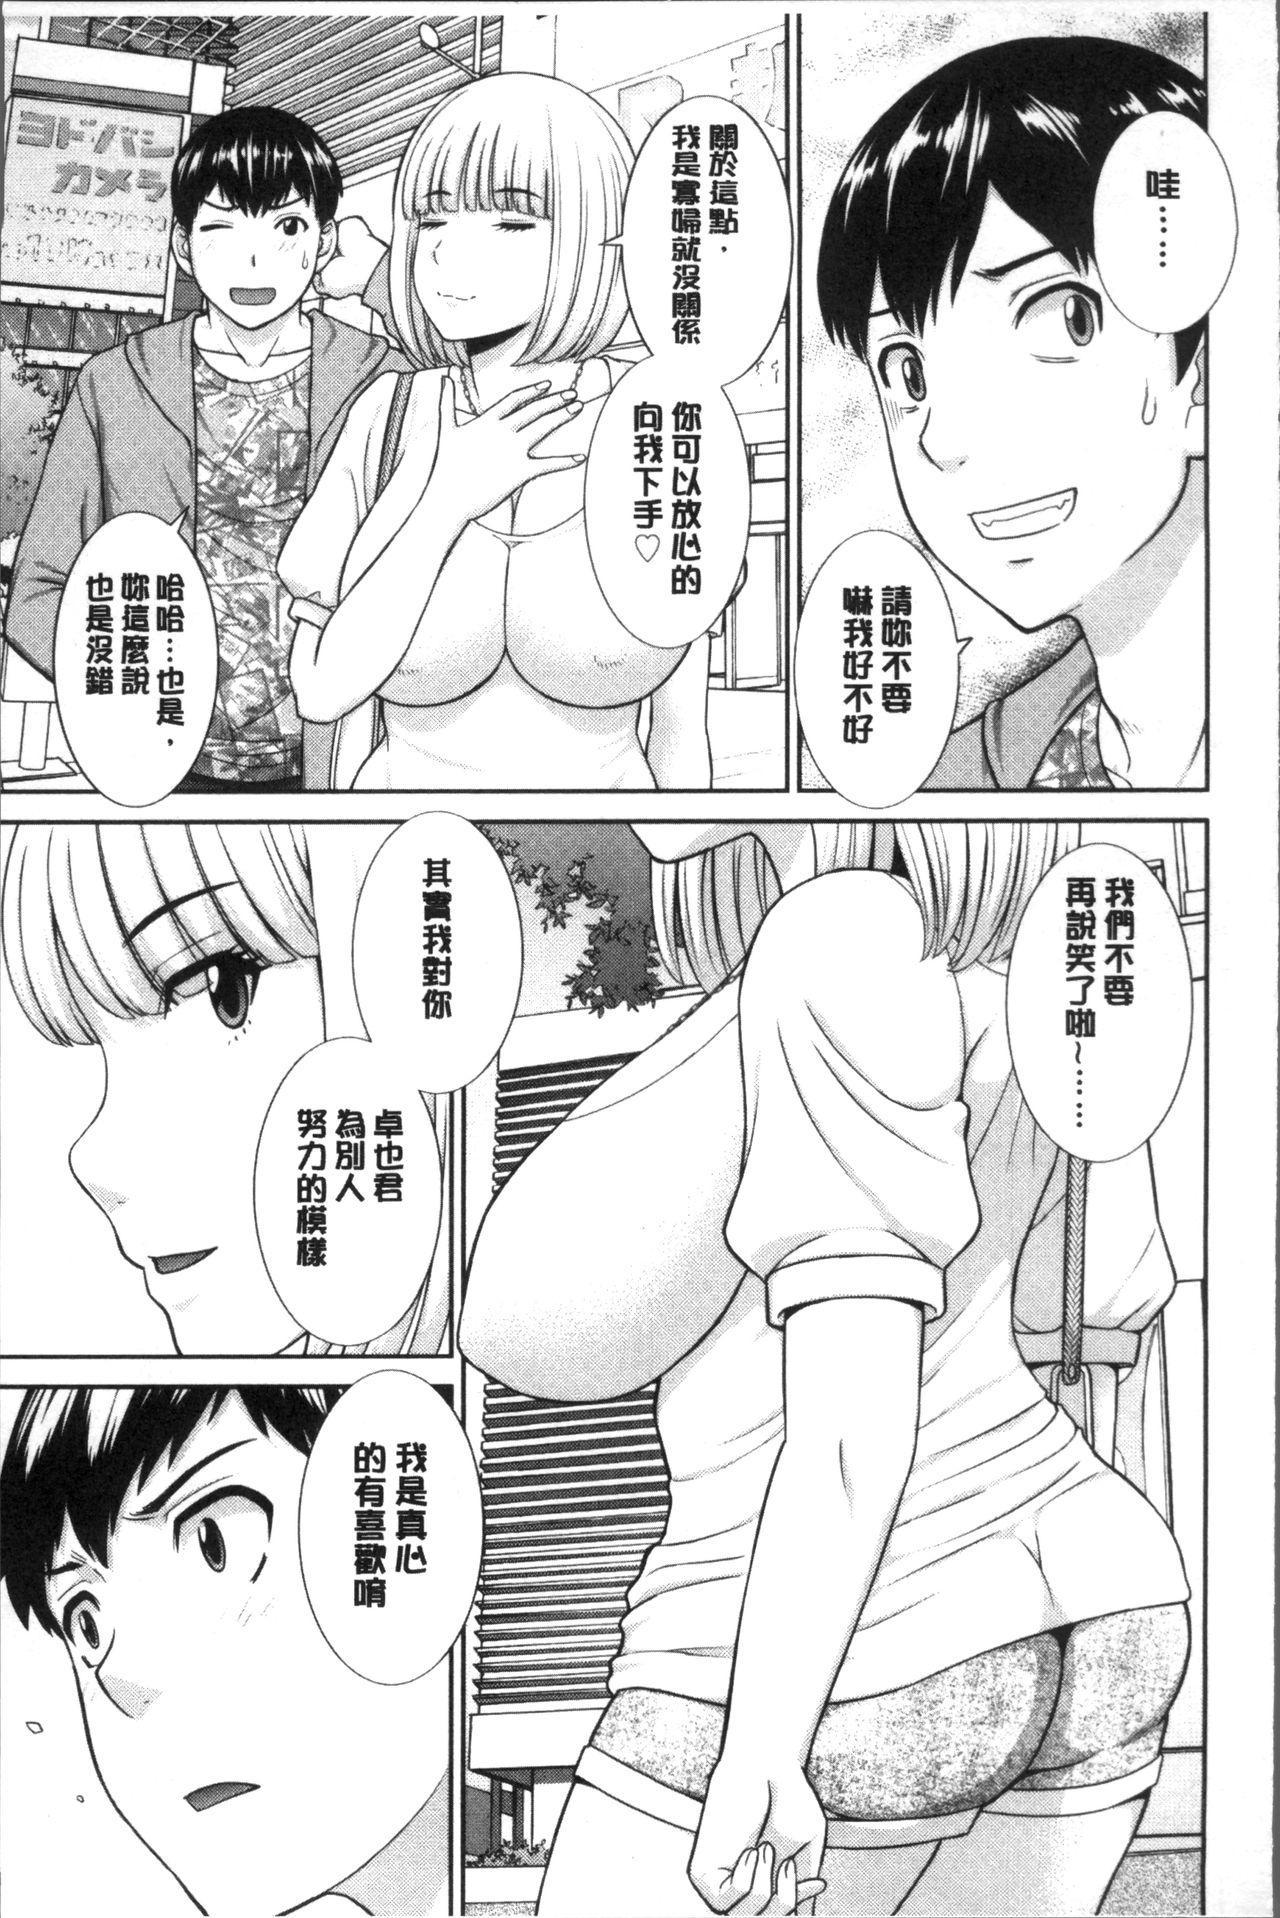 [Kawamori Misaki] Innyuu Shufu no Futei Ganbou - Oku-san to Kanojo to 2 | 淫乳主婦的不貞願望 和人妻也和女友❤2 [Chinese] 116